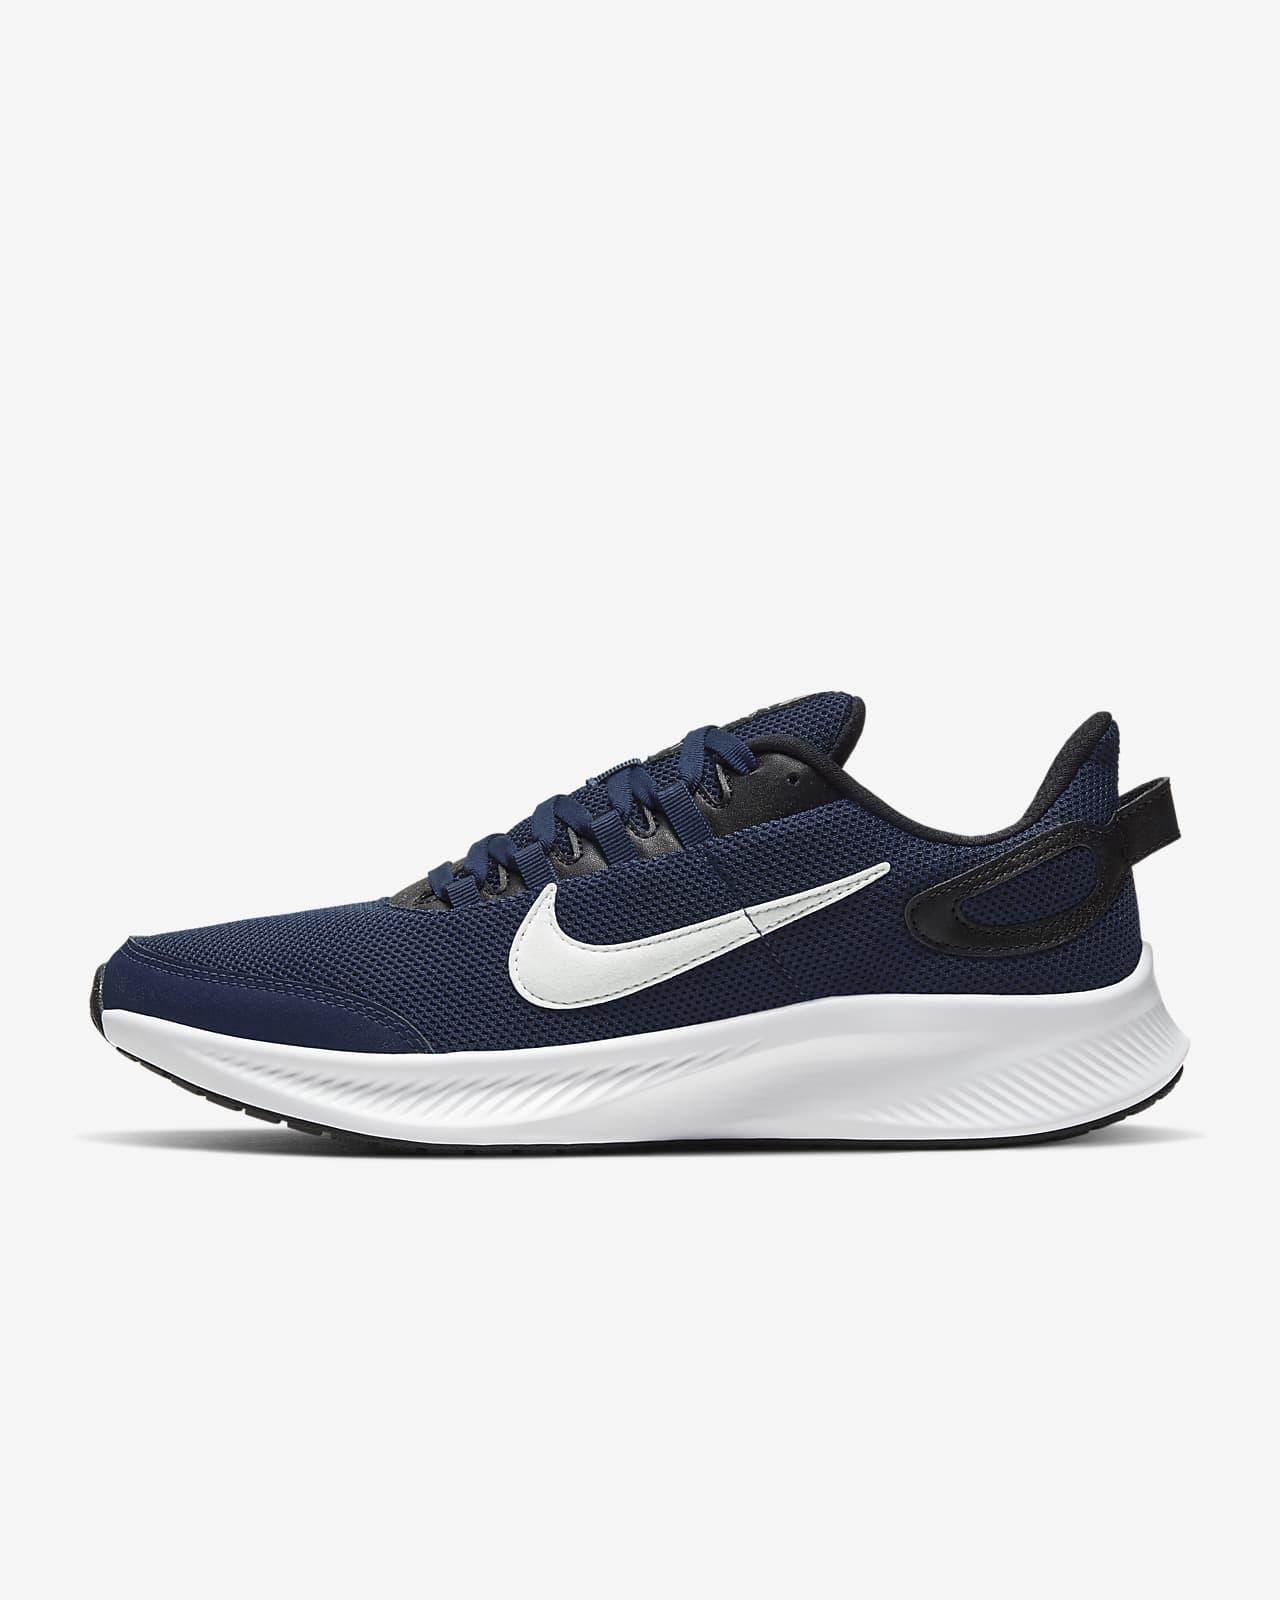 Sapatilhas de running Nike Run All Day 2 para homem